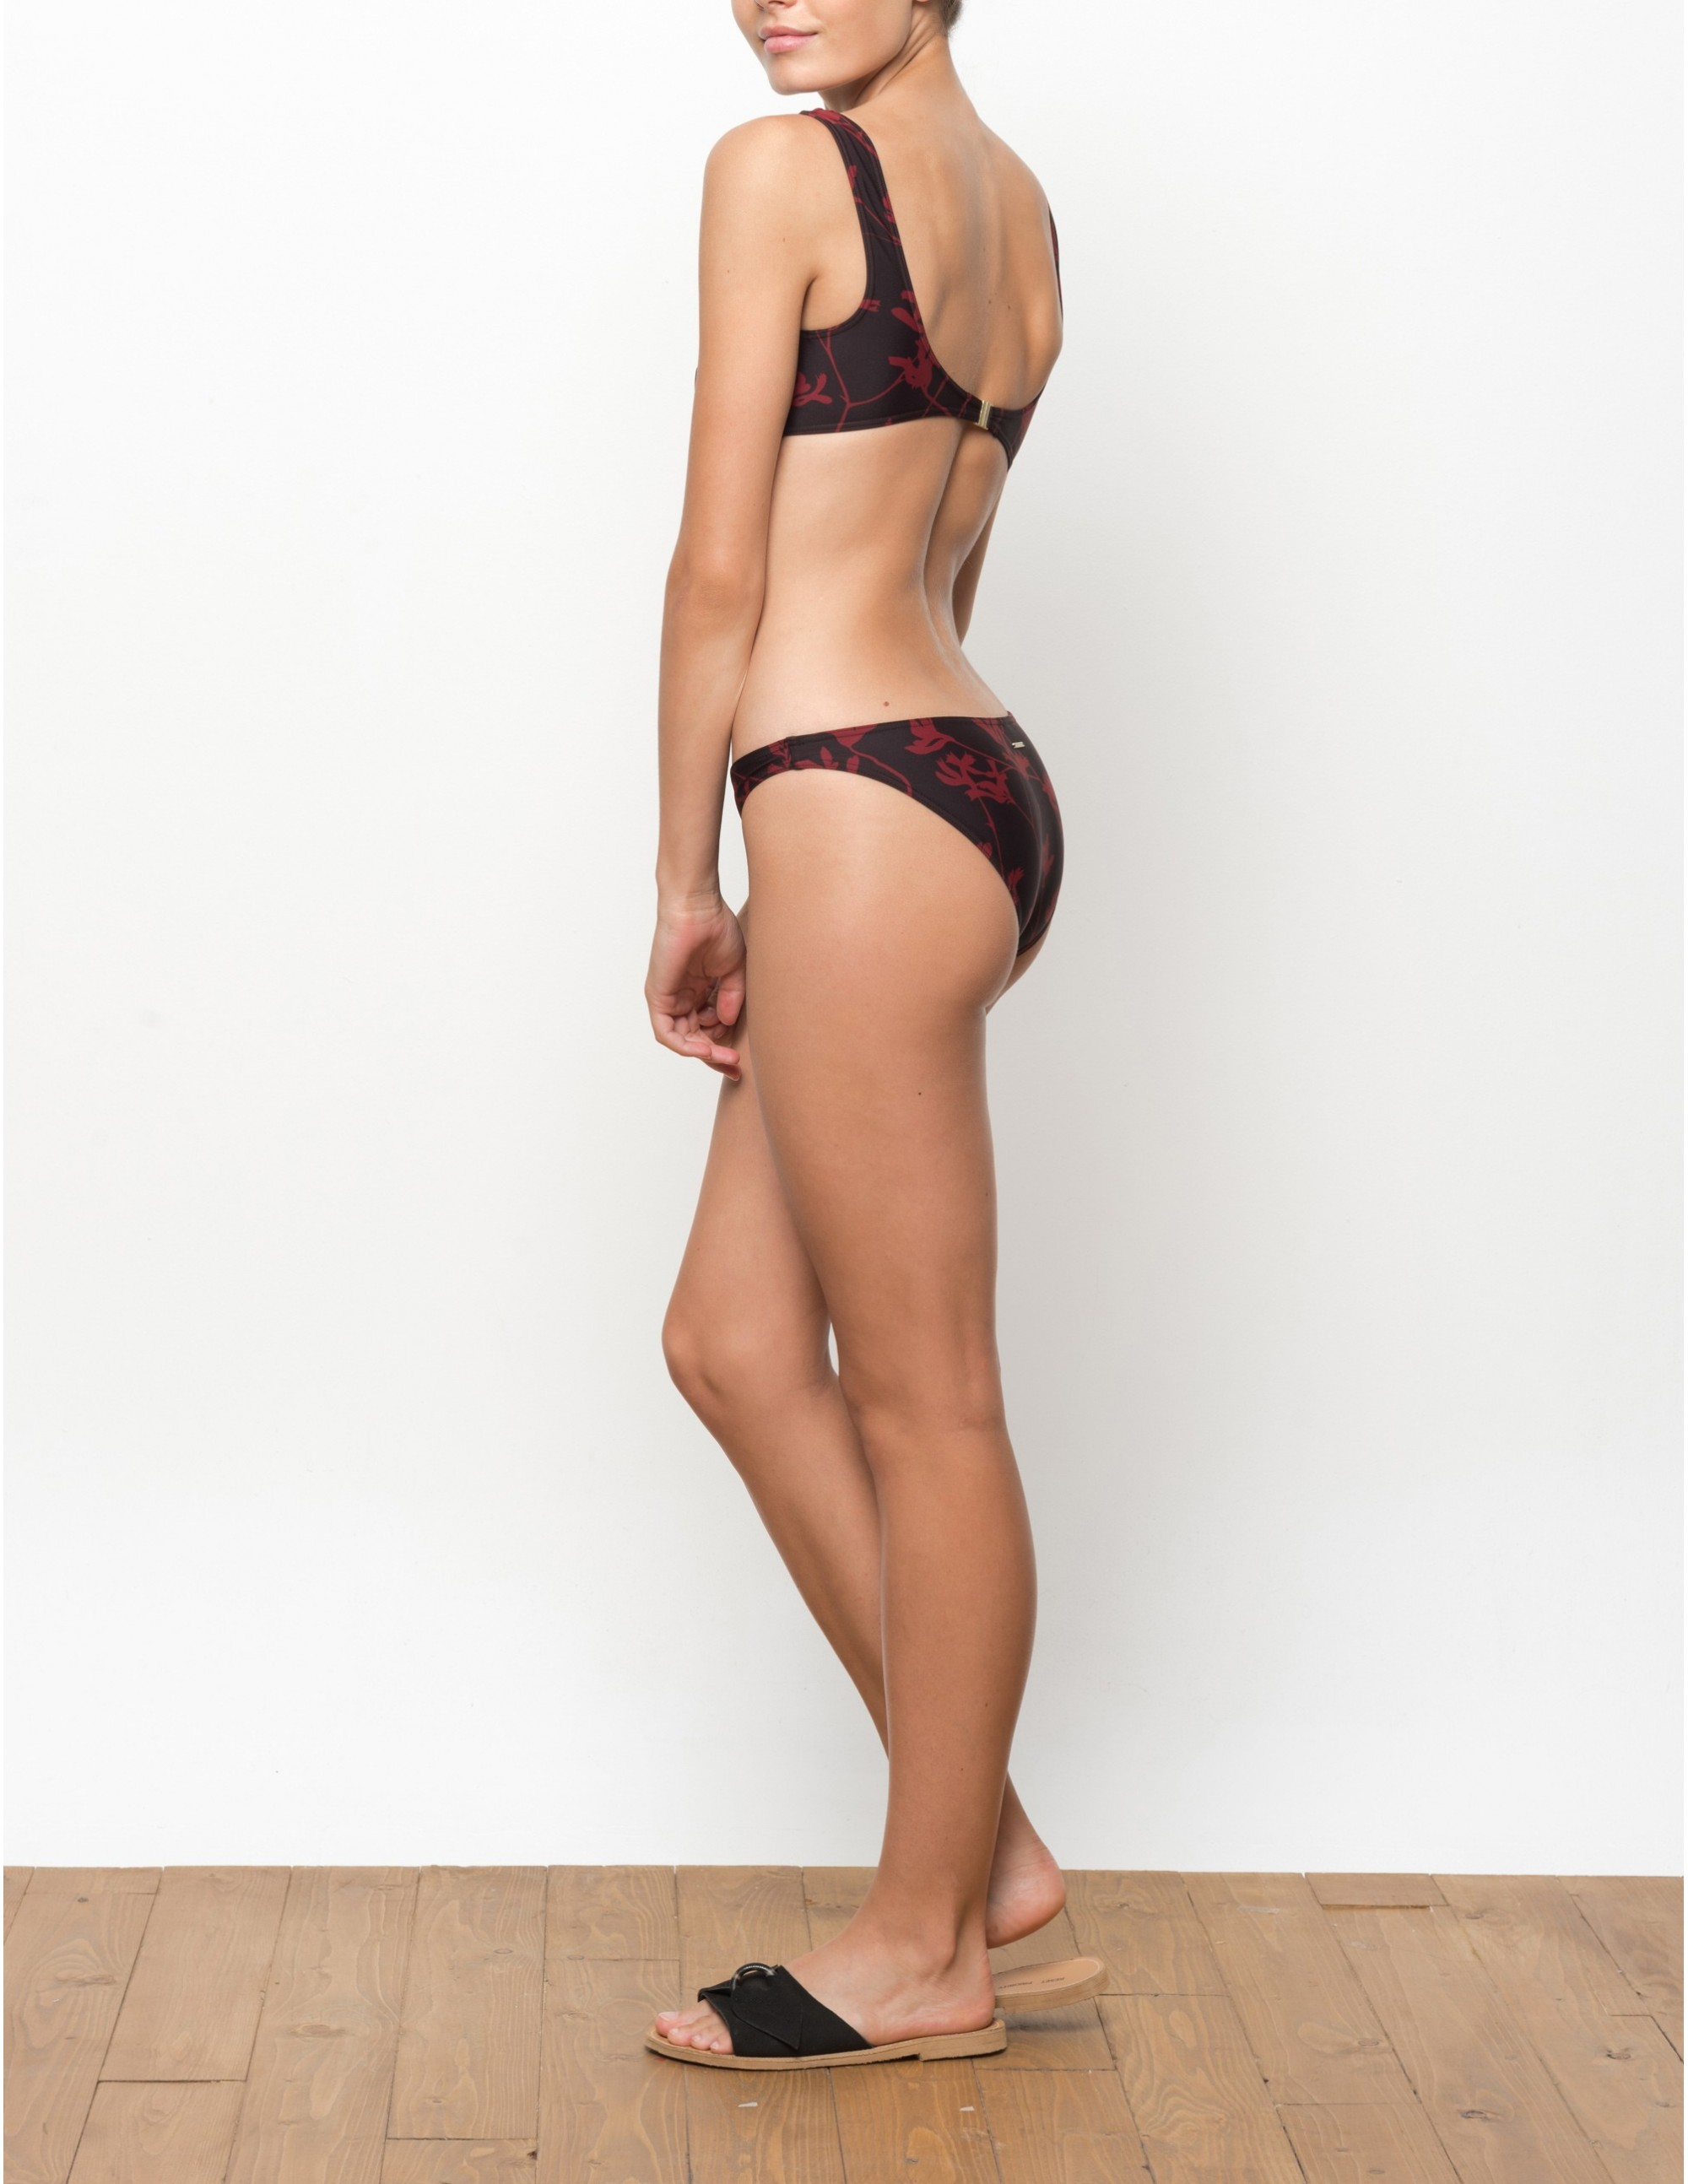 PARAISO bikini bottom - FLAME LILLY